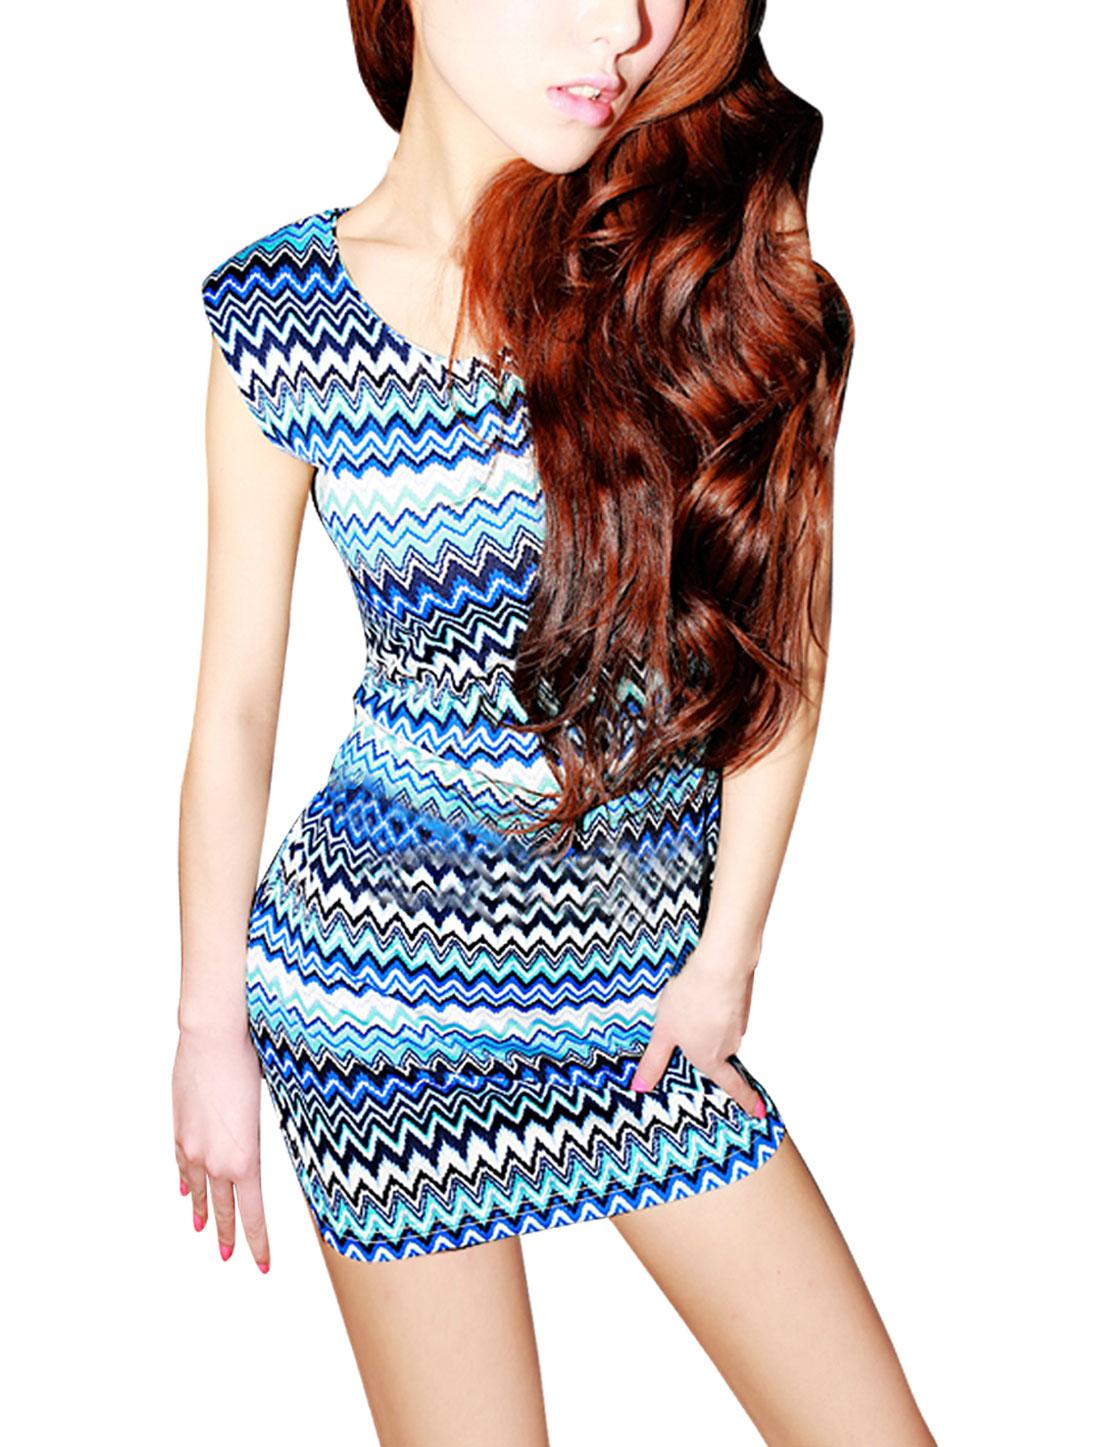 Lady Aqua Blue Scoop Neck Sleeveless Padded Shoulder Wave Print Mini Dress XS